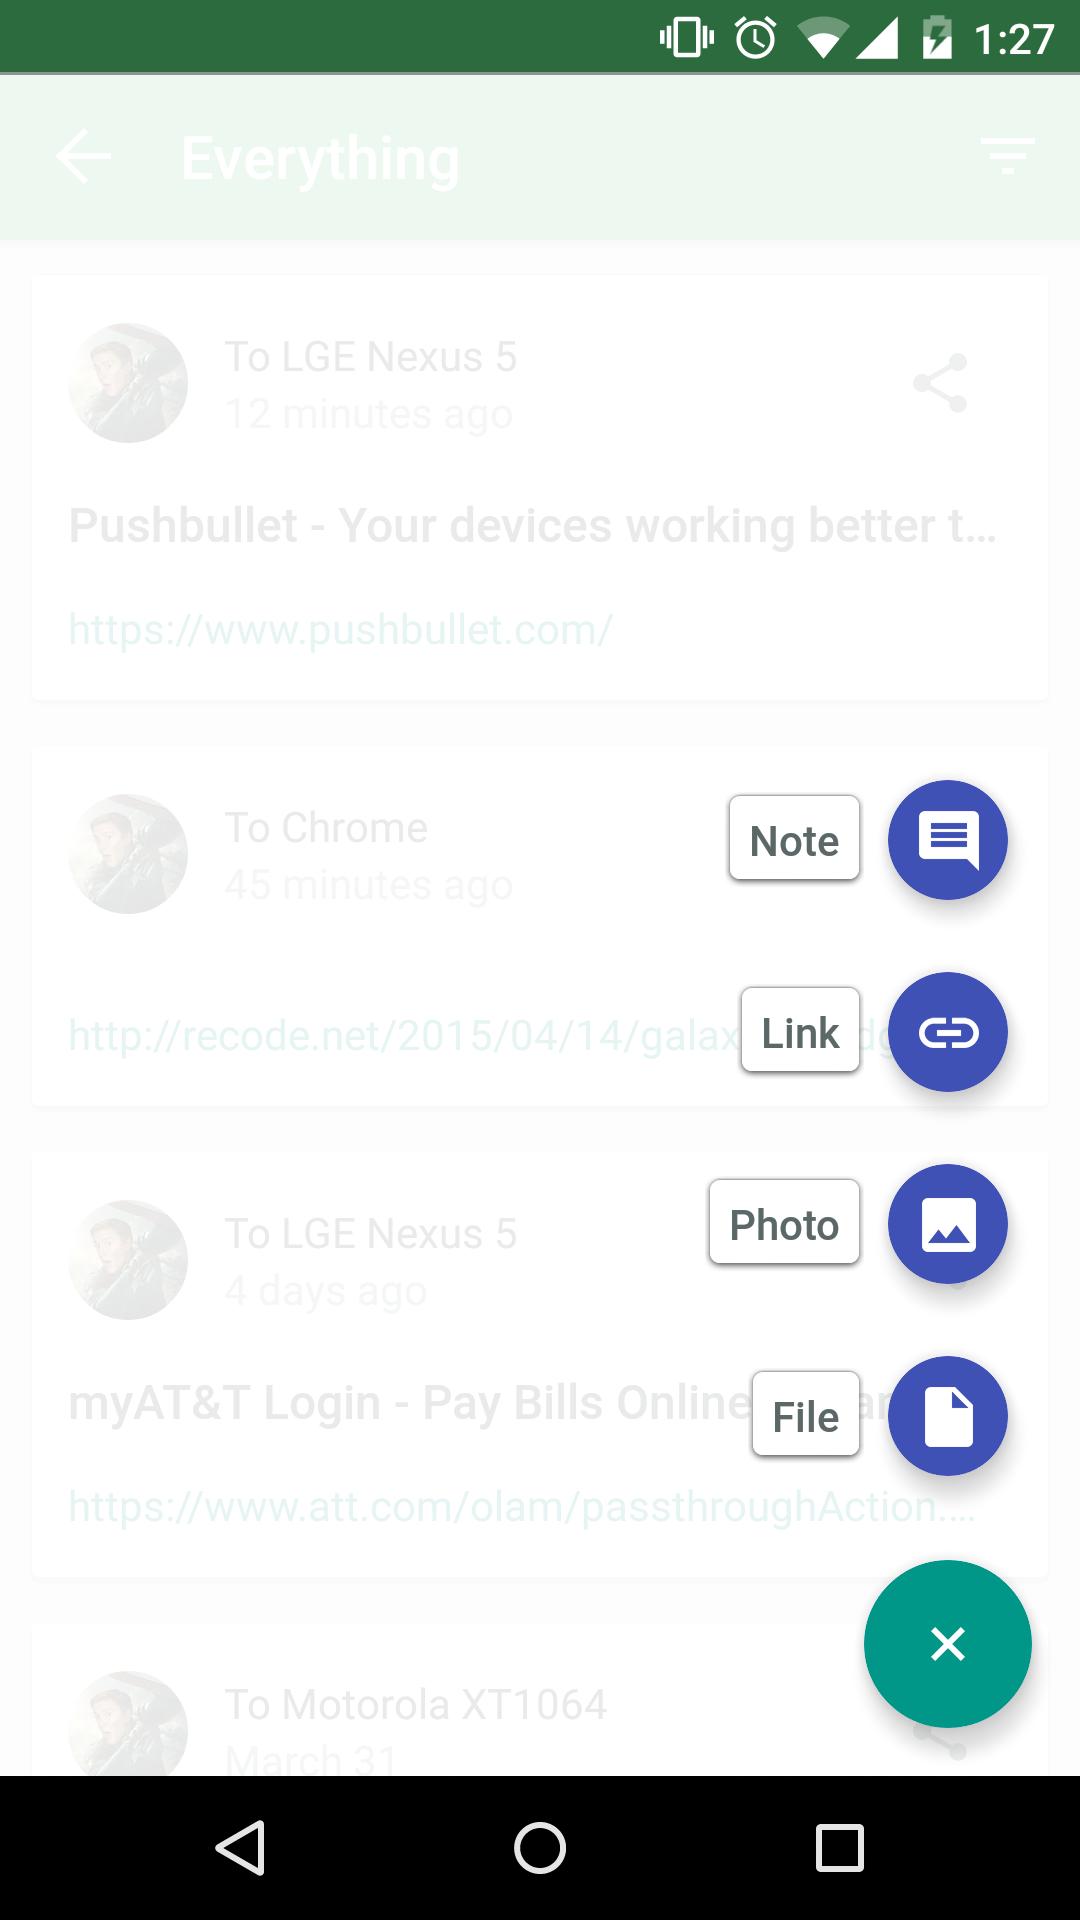 Pushbullet_main